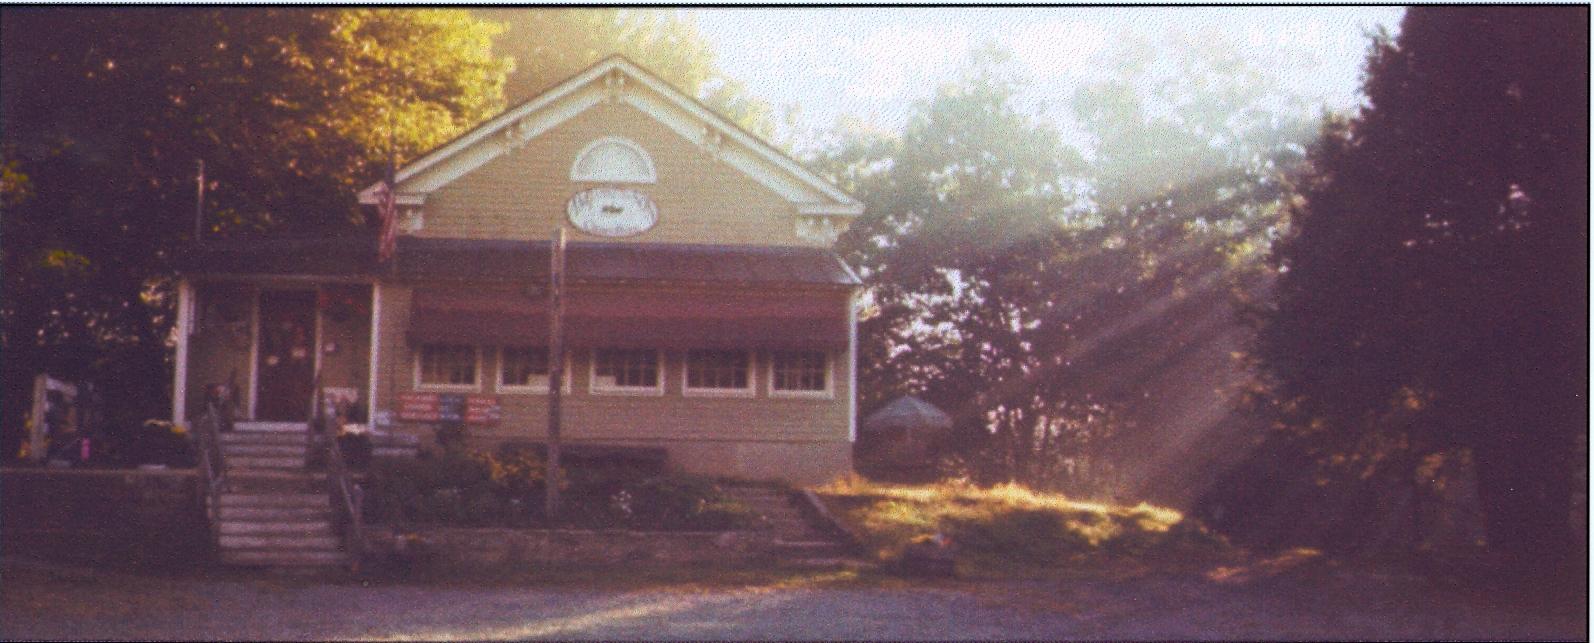 Janney's Store - 1996